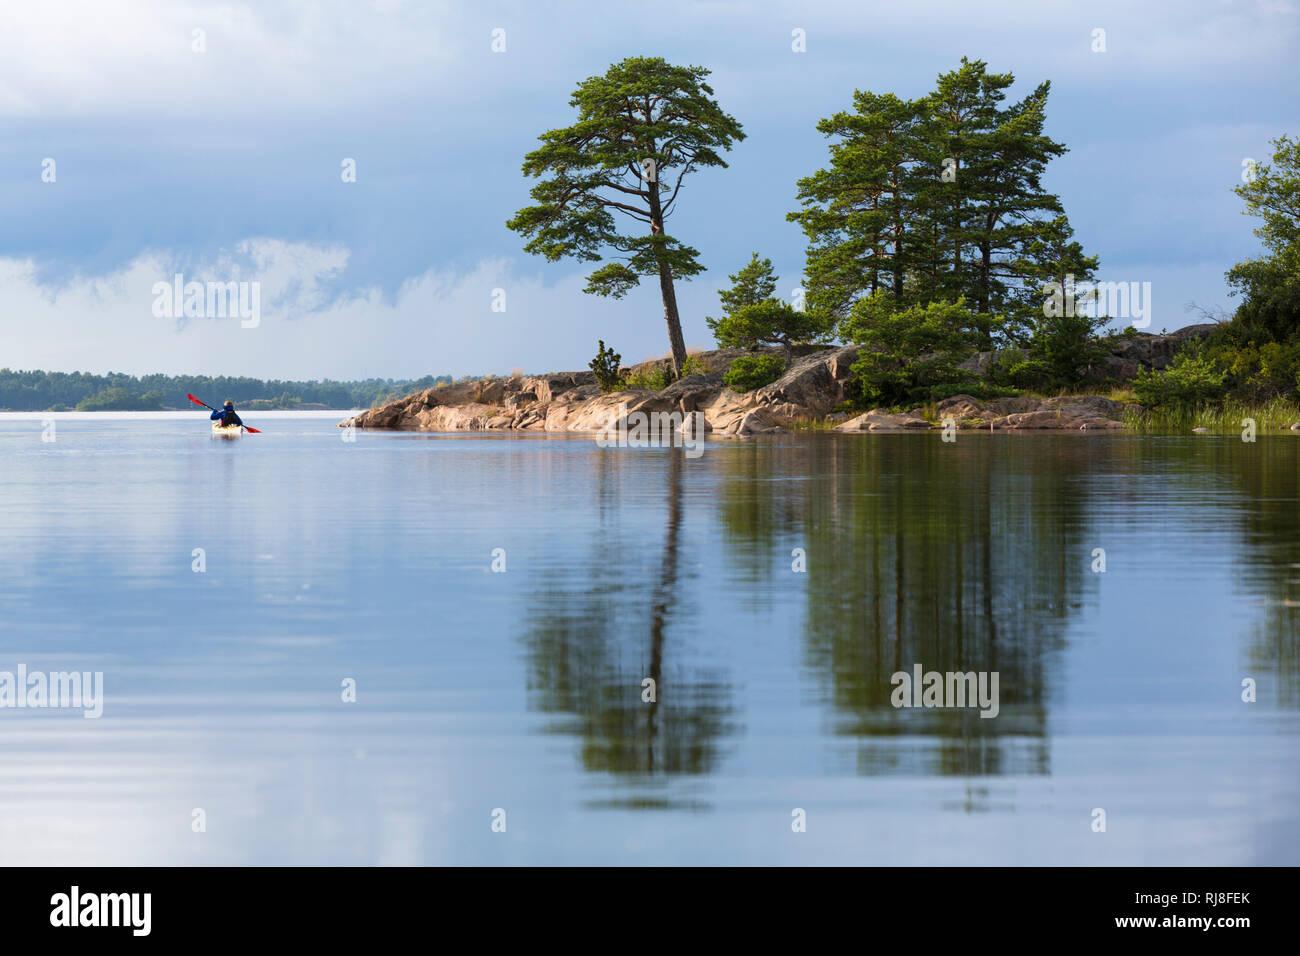 Schweden, Schärengarten, einzelner Kajakfahrer in Landschaft - Stock Image